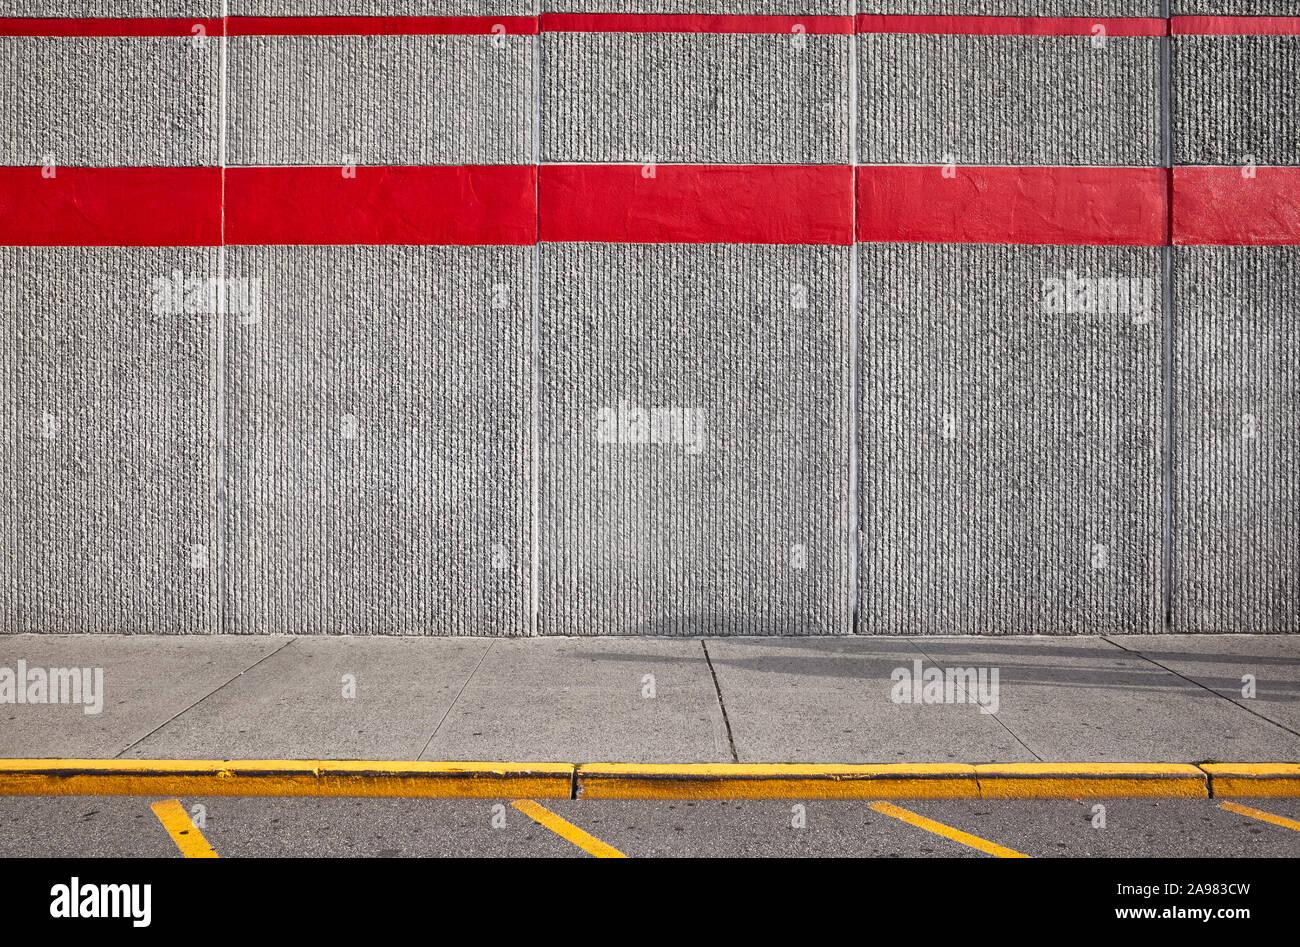 Sidewalk with concrete wall, urban background. Stock Photo